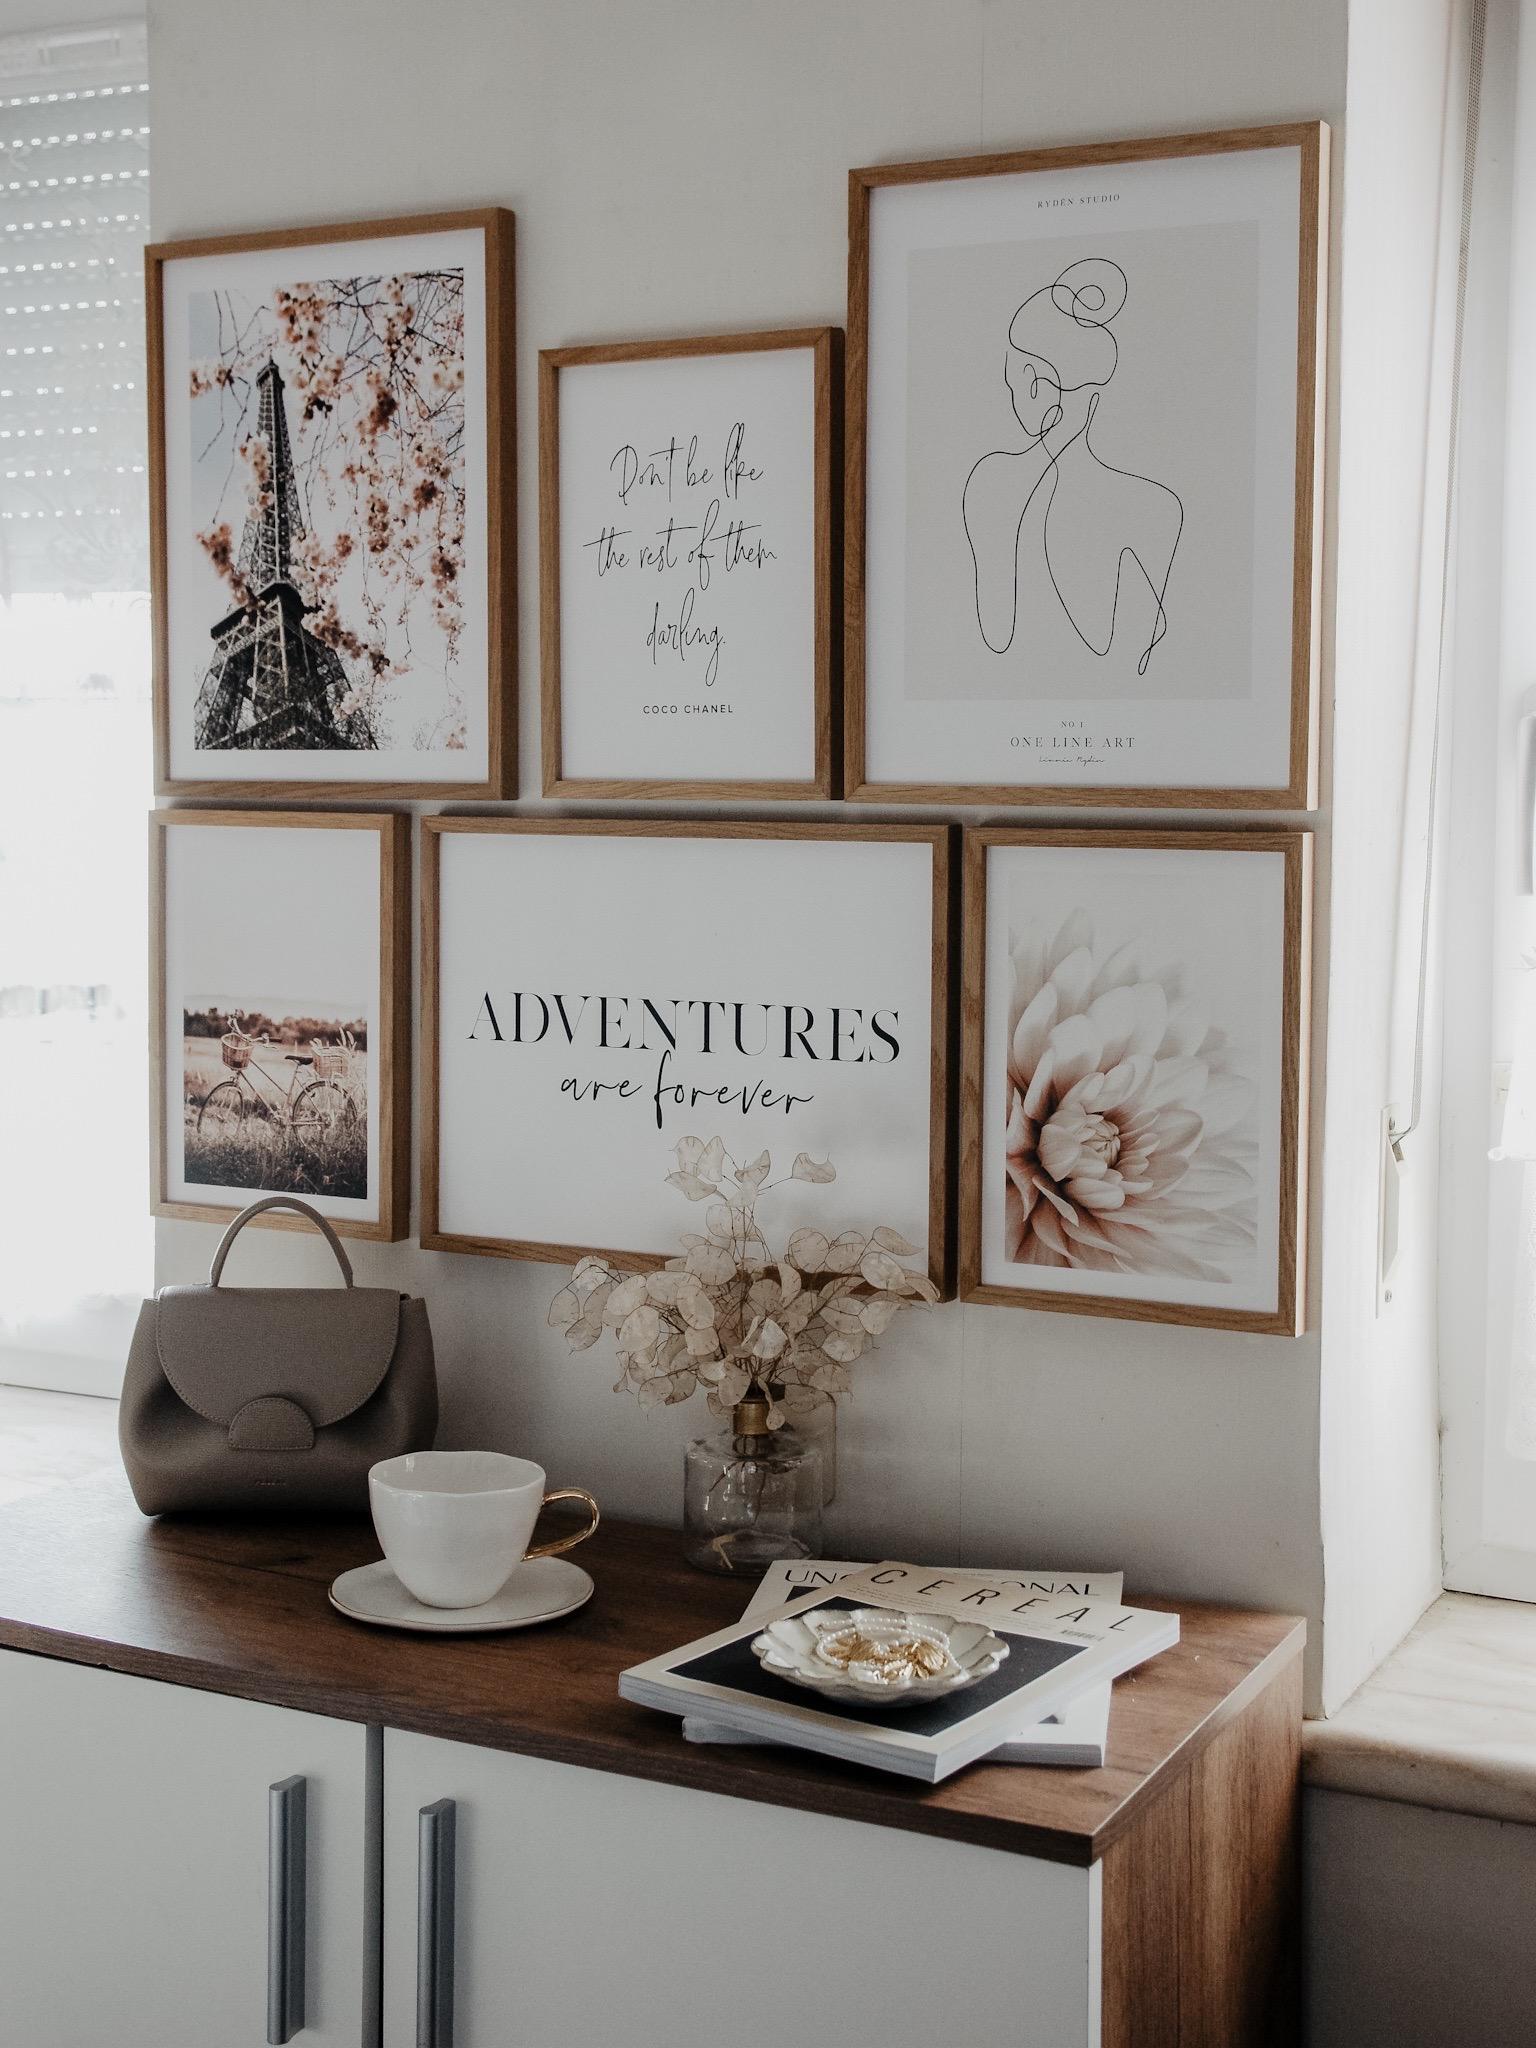 Poster Store Posterwall Bildwand Frühling Typografie interior